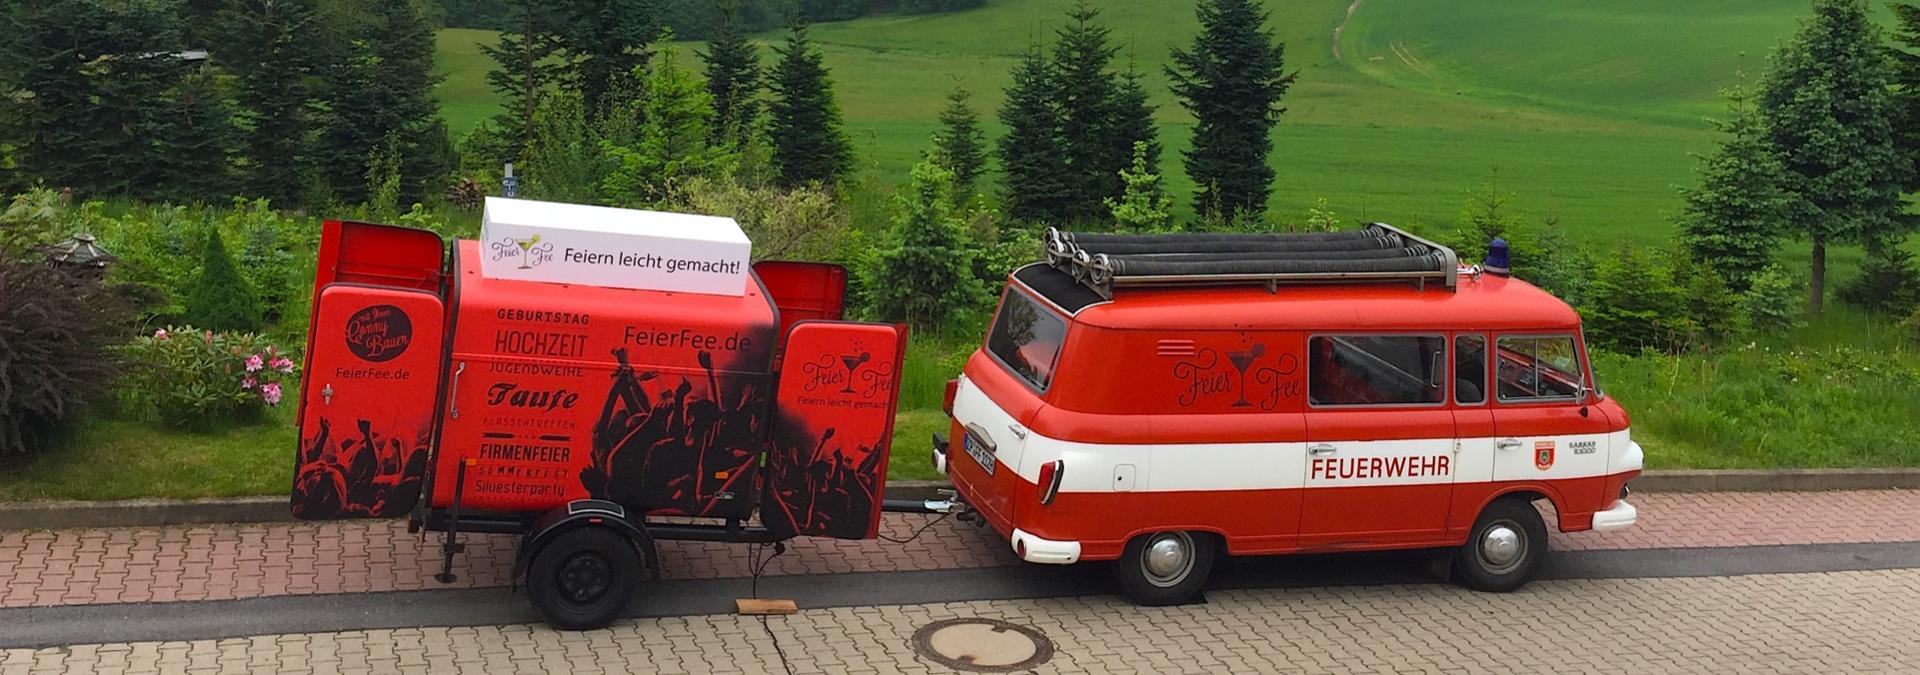 Headergrafik-Zapfanlage-mit-Haenger-BarkasP1000-FeierFee